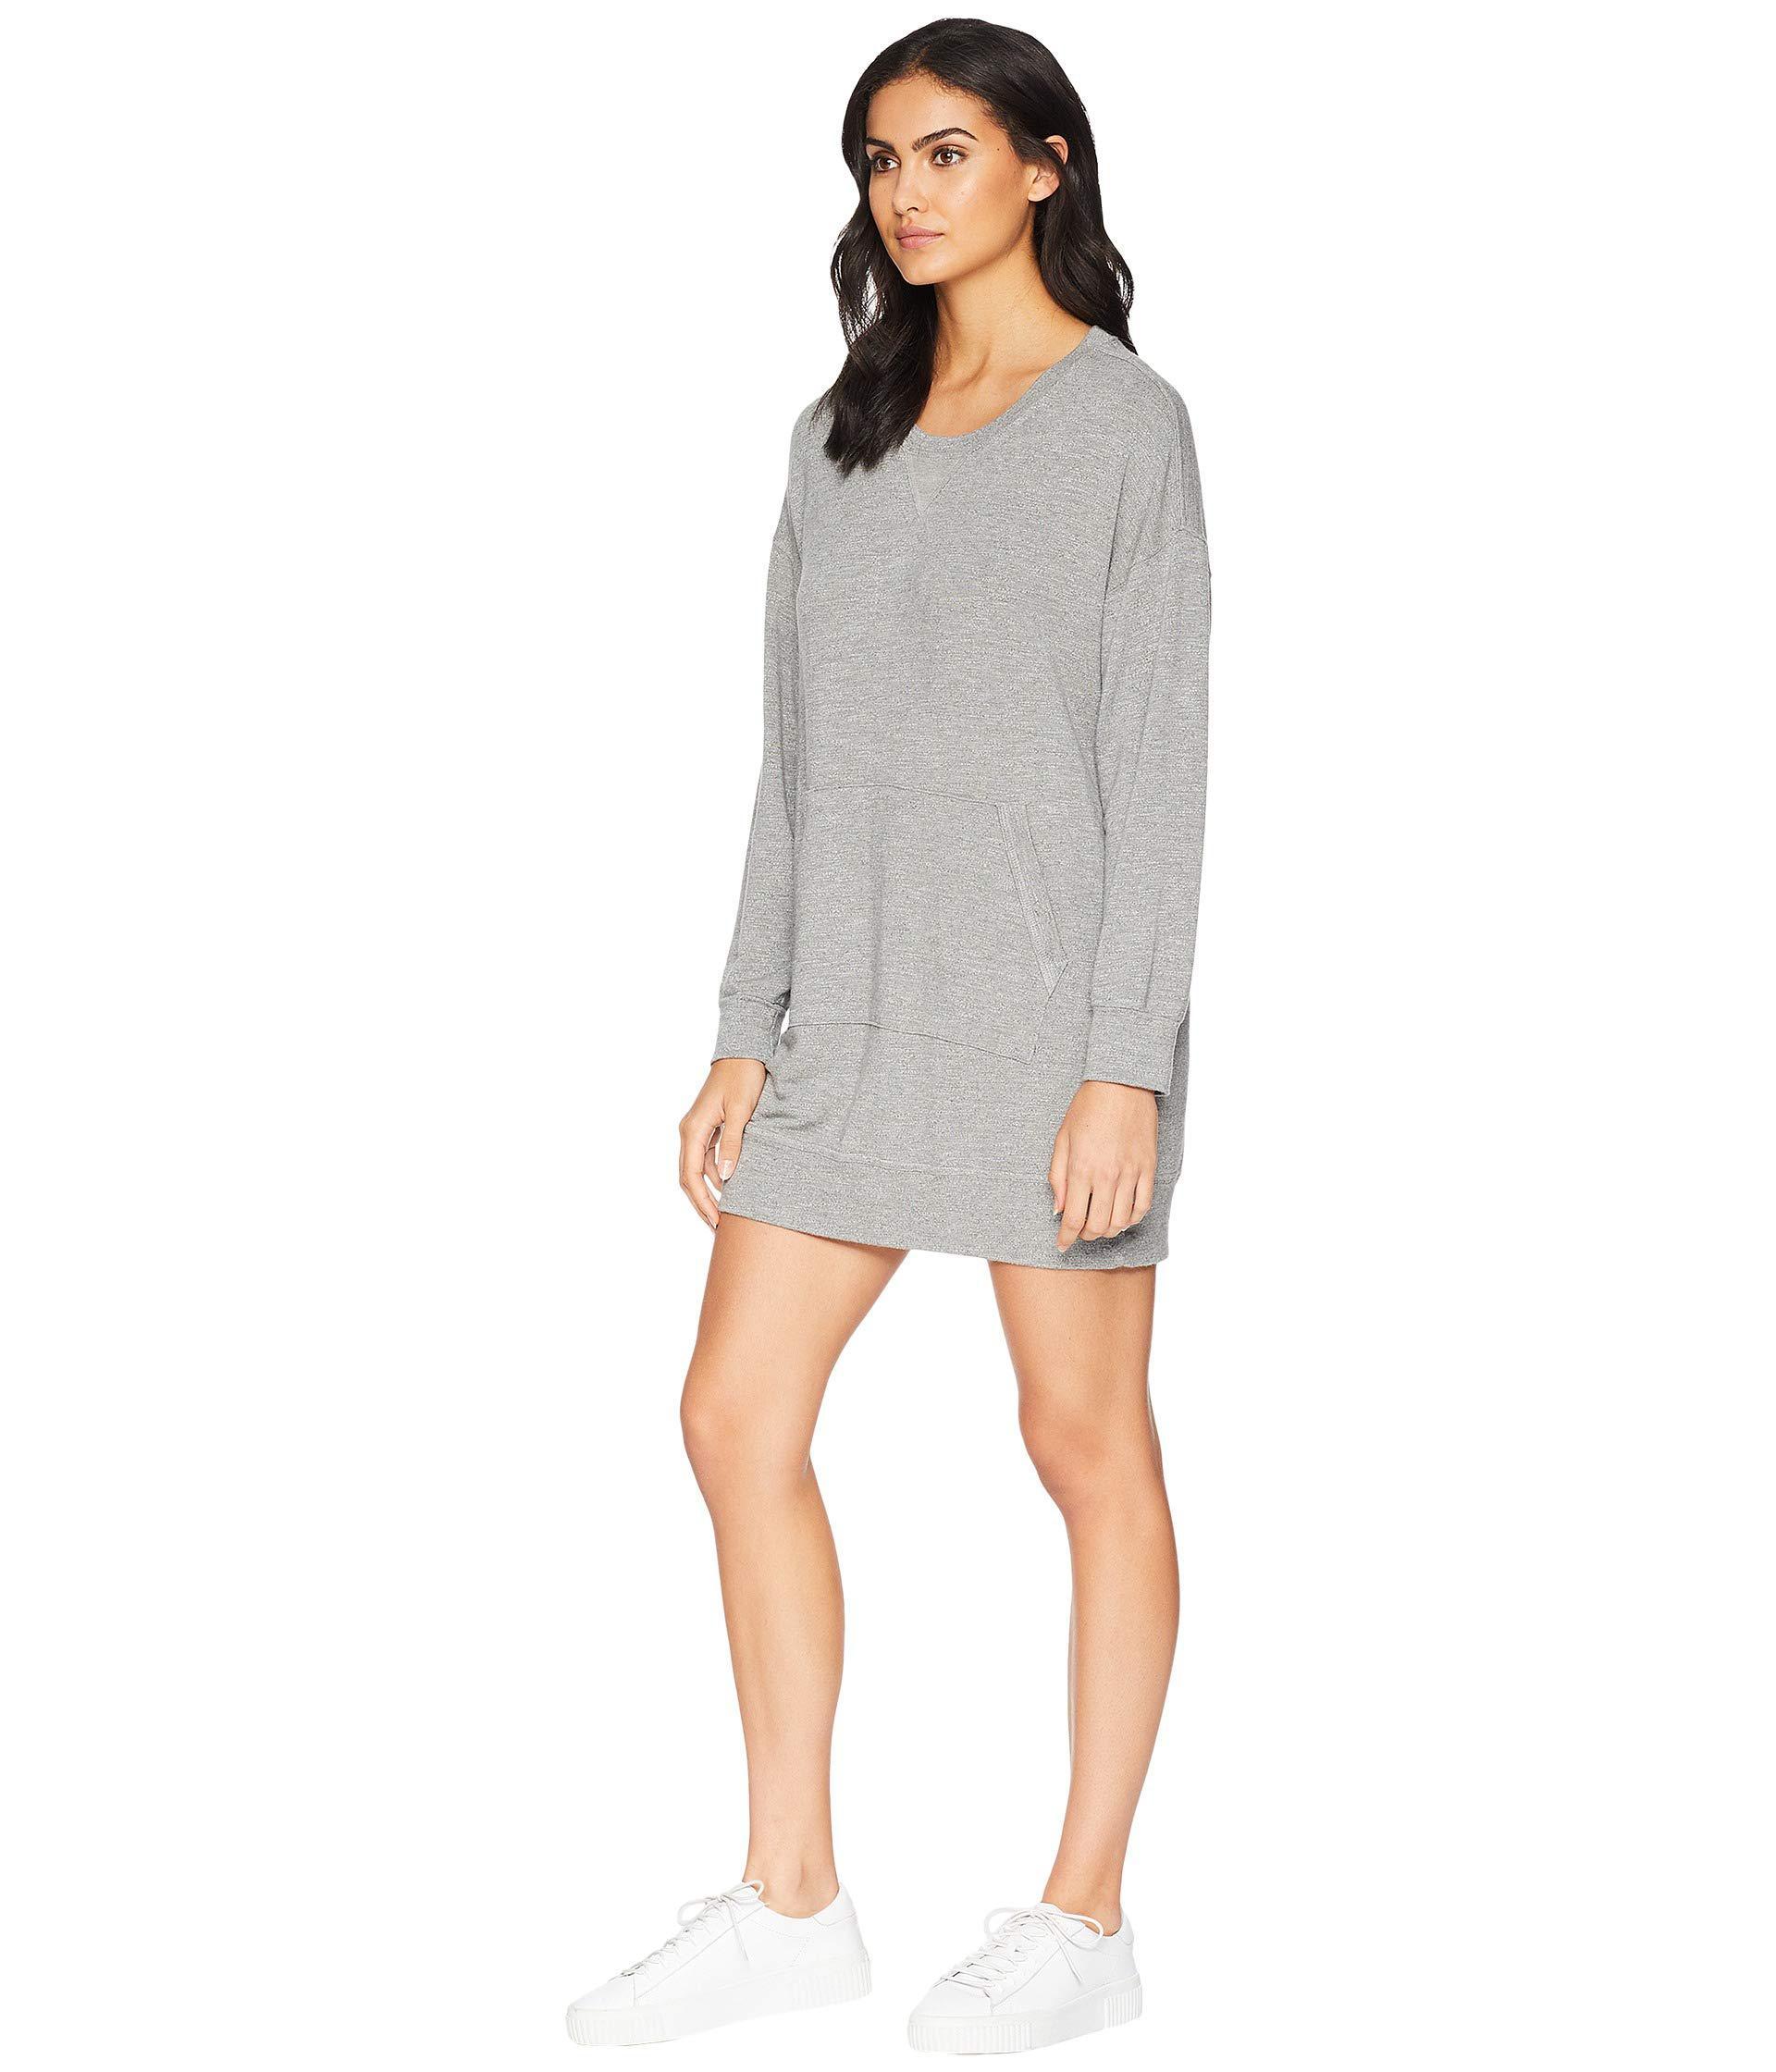 Lyst - Splendid Dream Slub Courtside Sweatshirt Dress (heather Grey) Women s  Dress in Gray 0b76fa7ac7